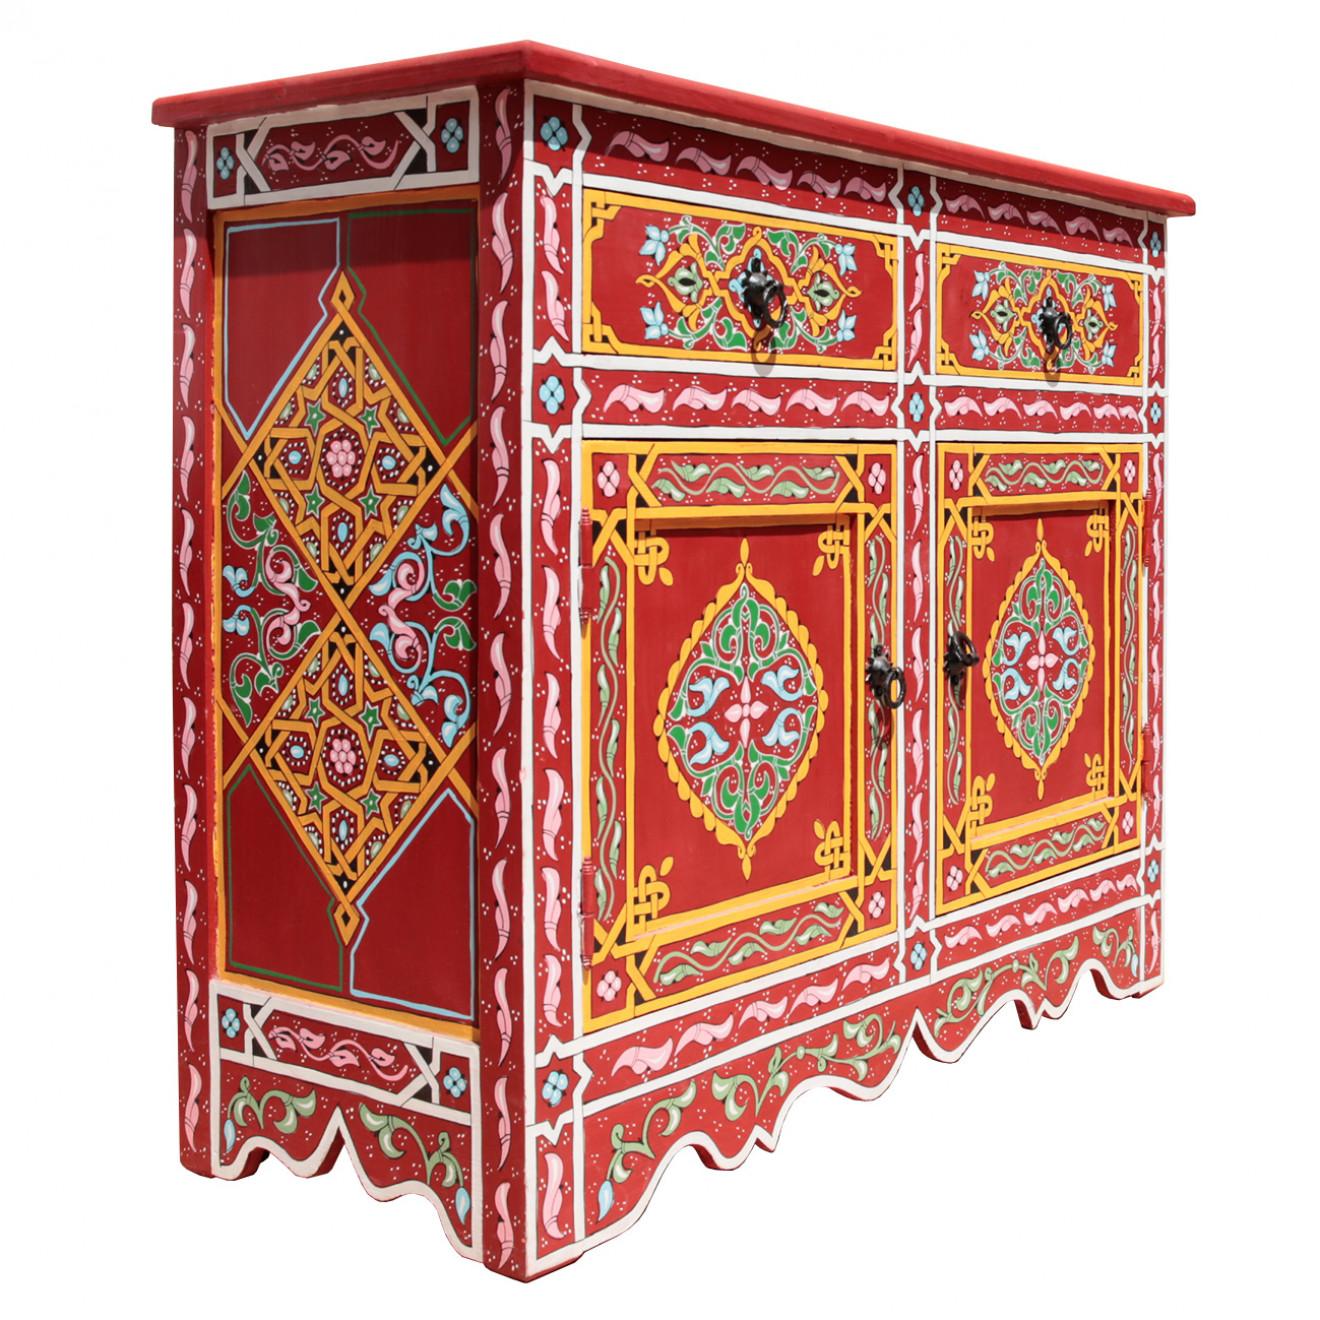 orientalische arabische marokkanische kommode schrank majorelle. Black Bedroom Furniture Sets. Home Design Ideas